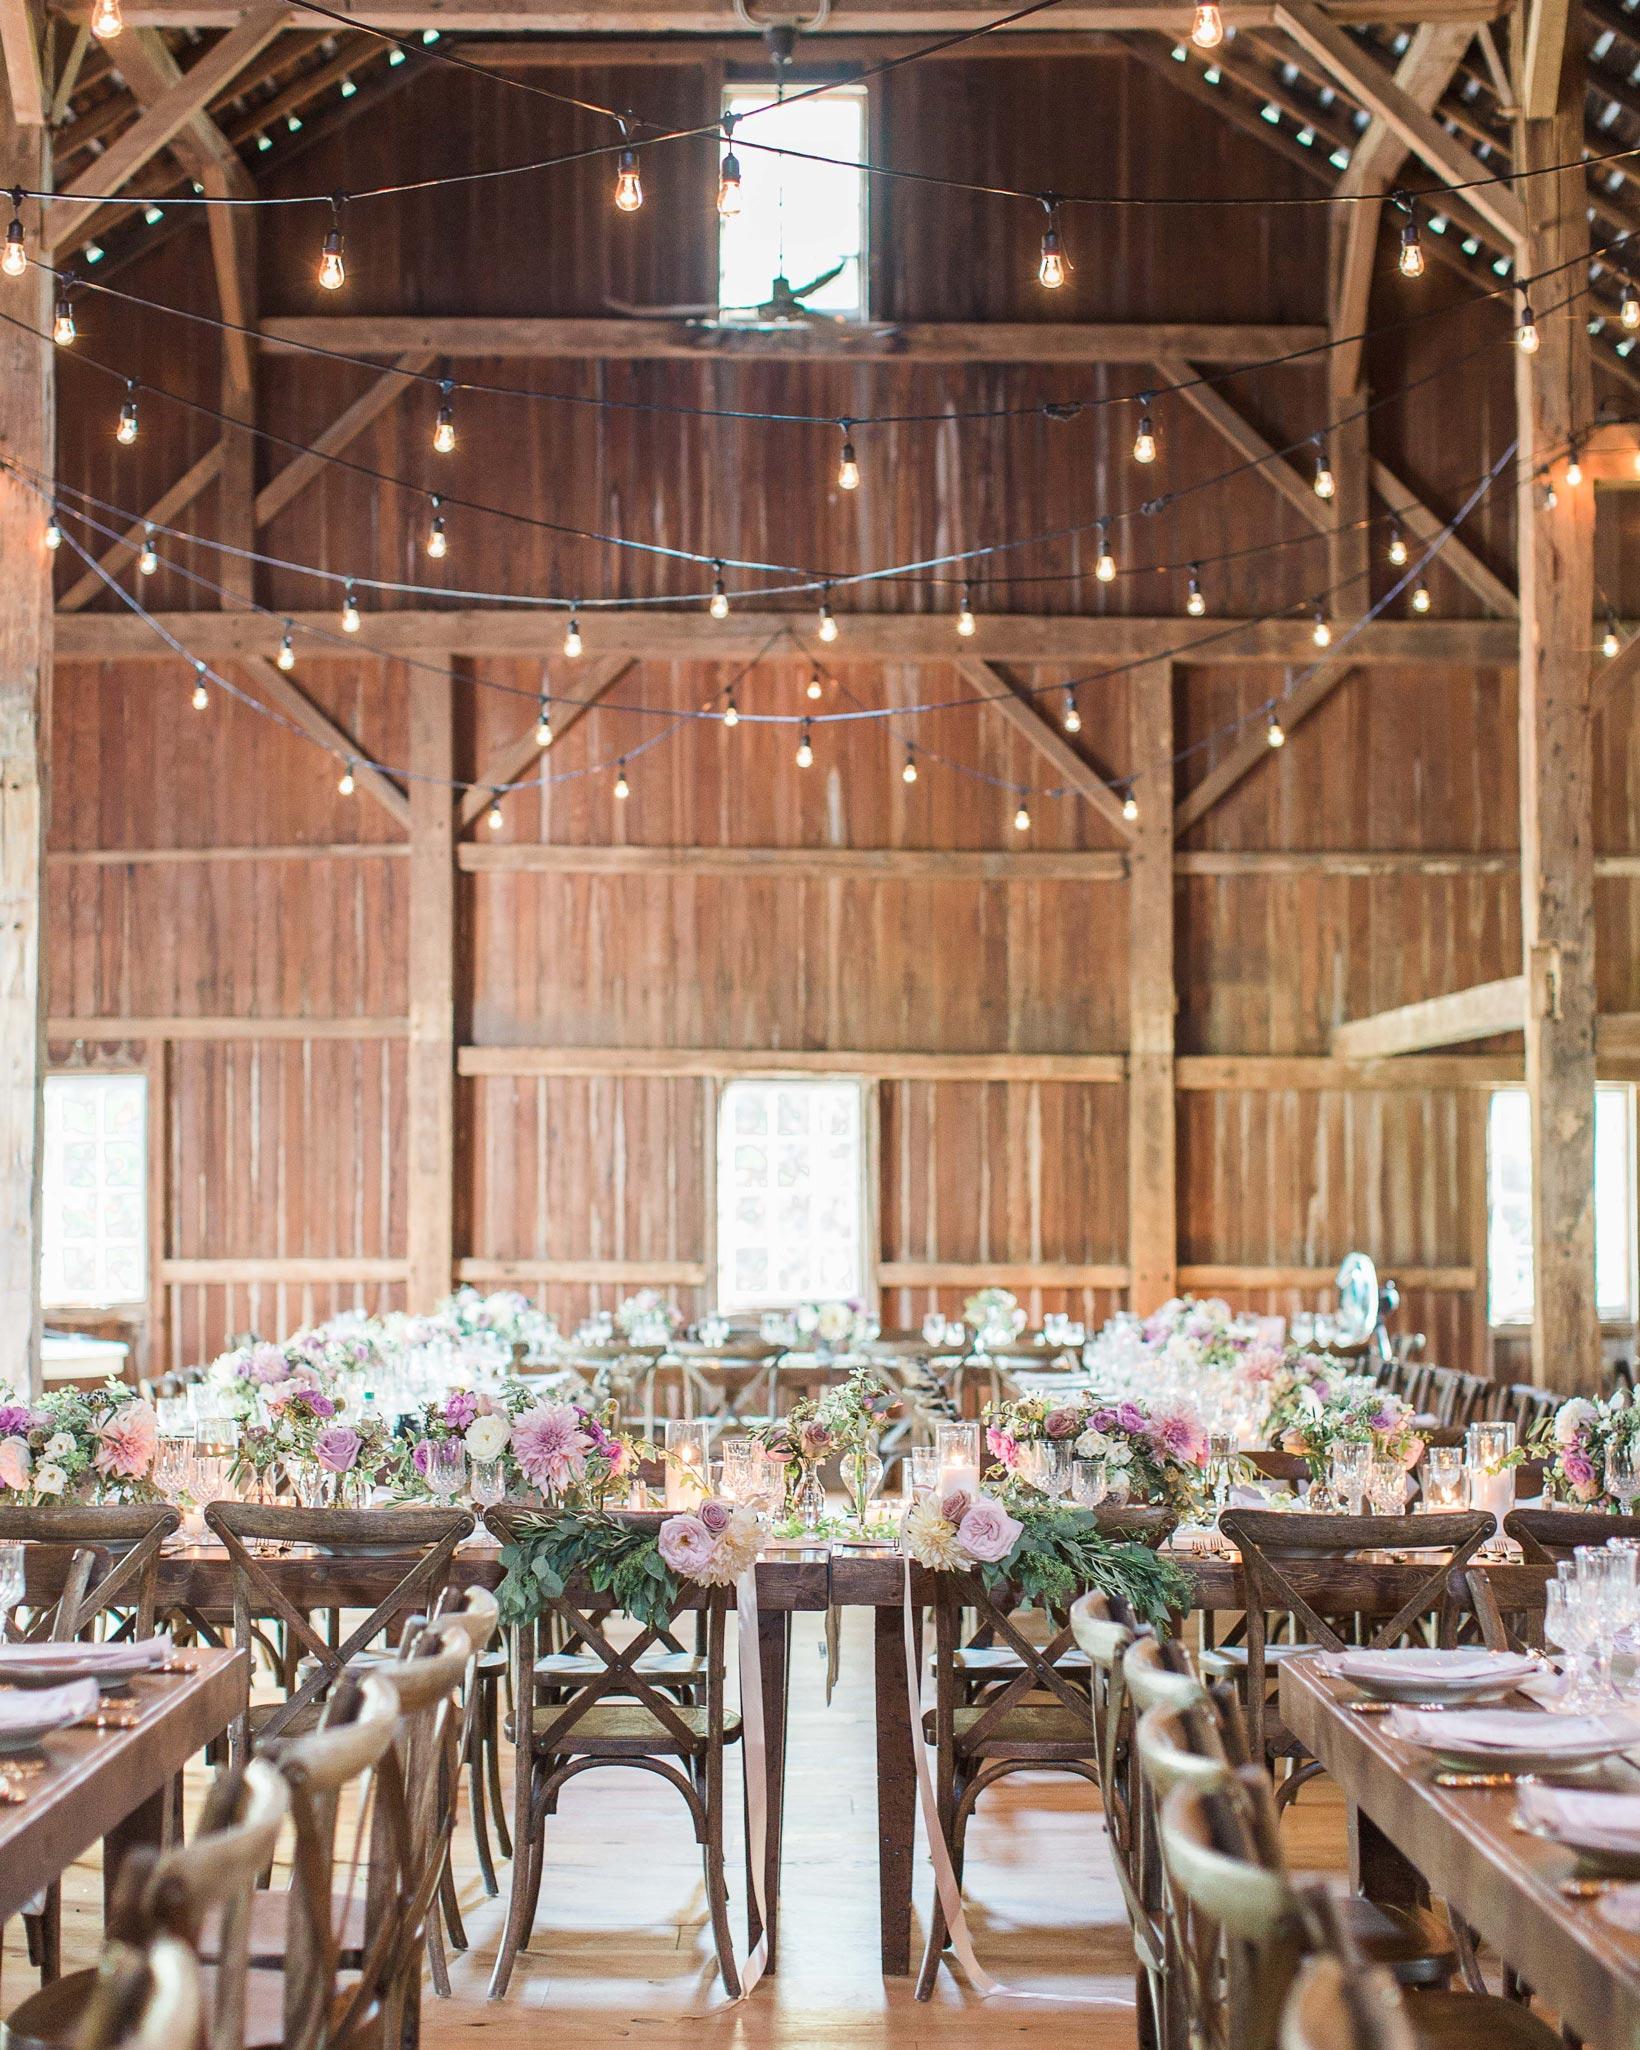 sarah-michael-wedding-reception-barn-772-s112783-0416.jpg